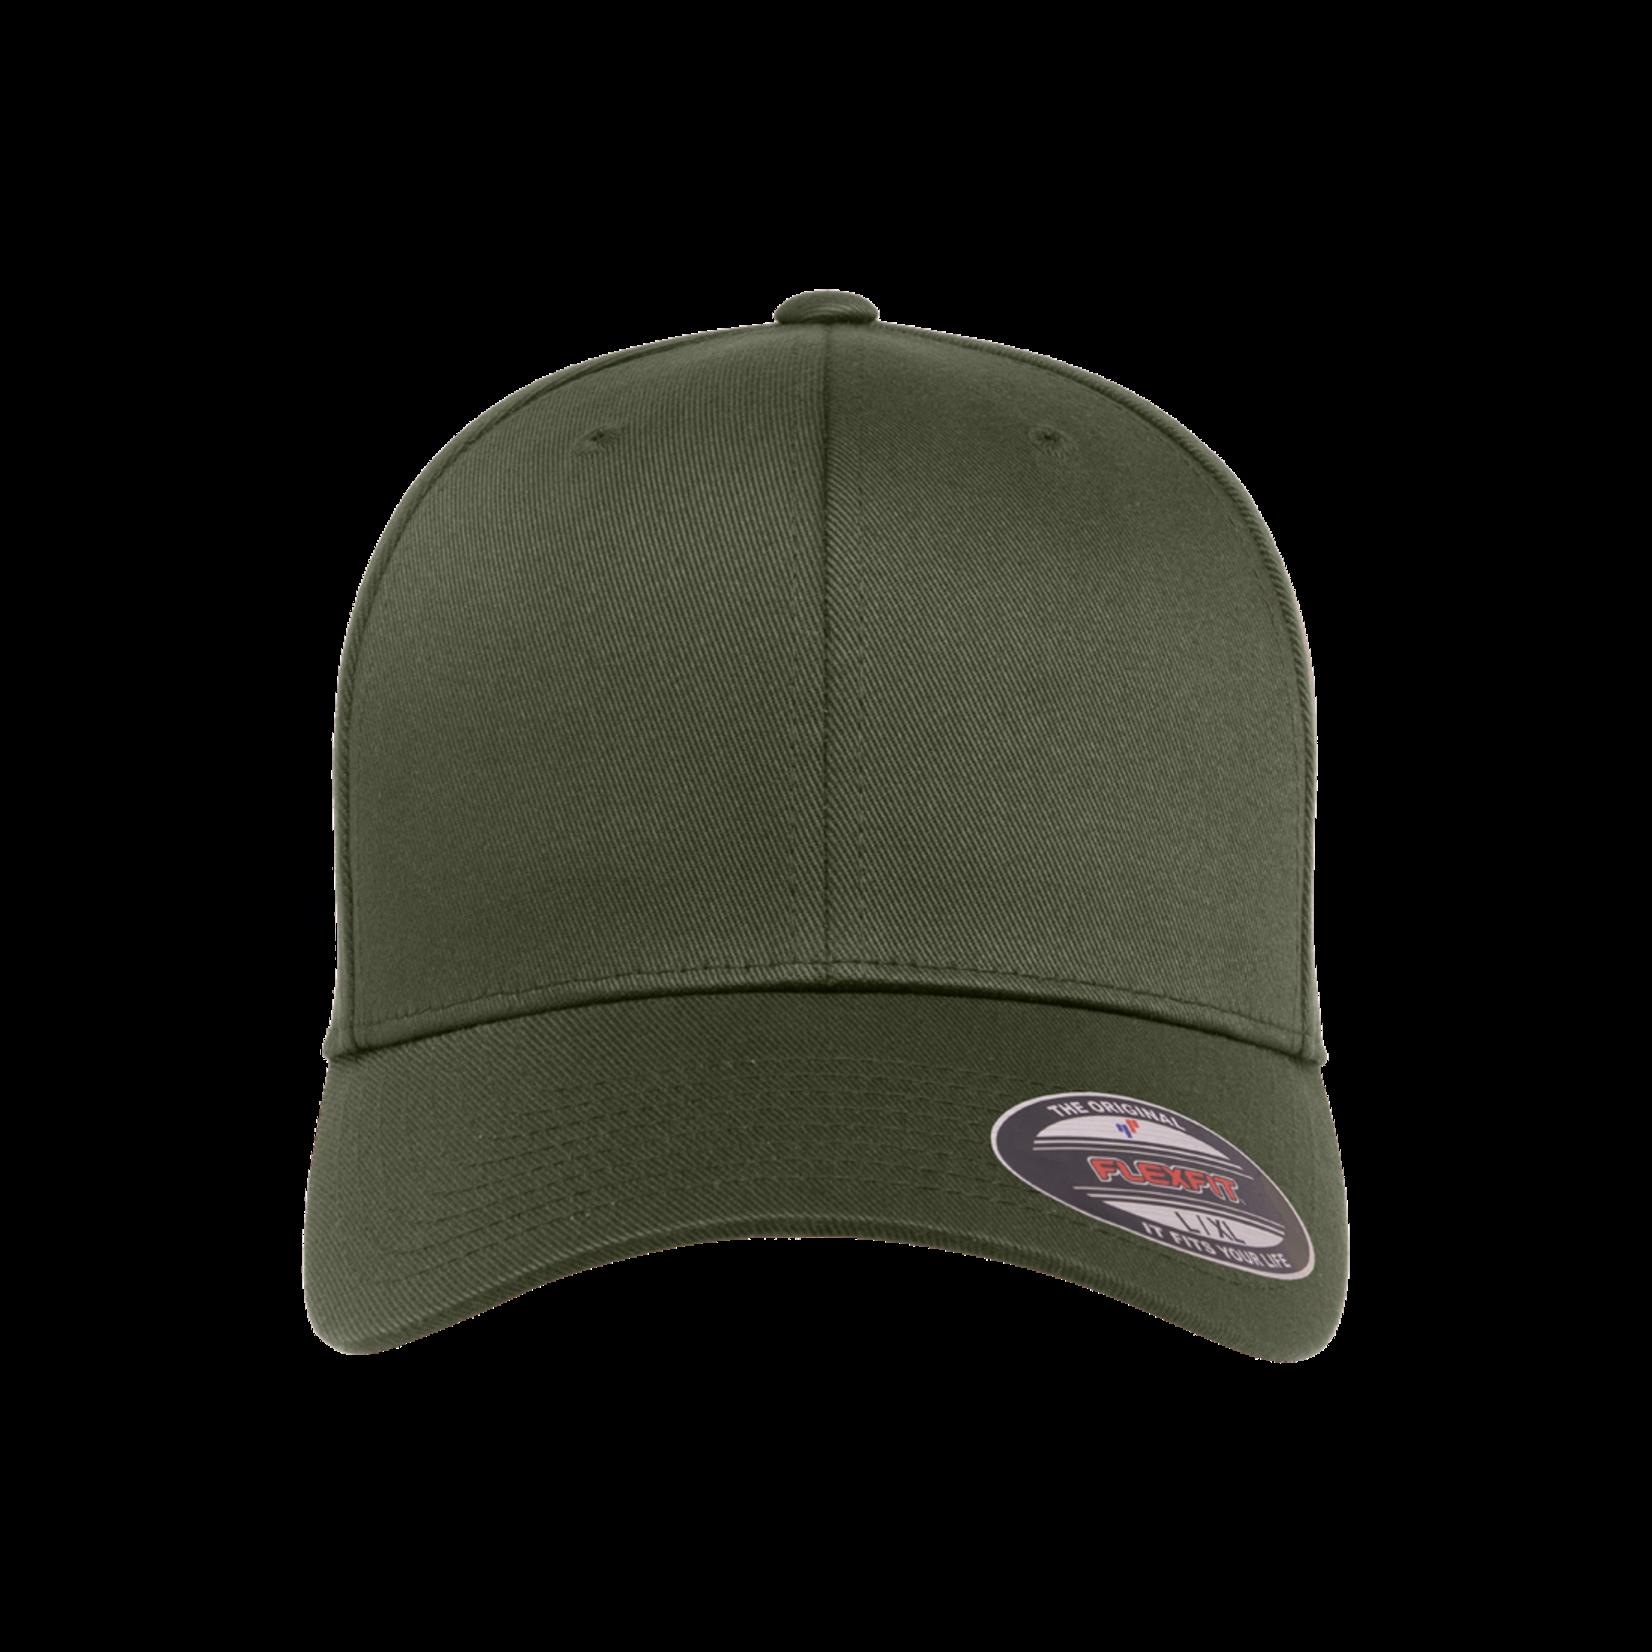 Flexfit Flexfit 6277 Classic Ballcap - Olive